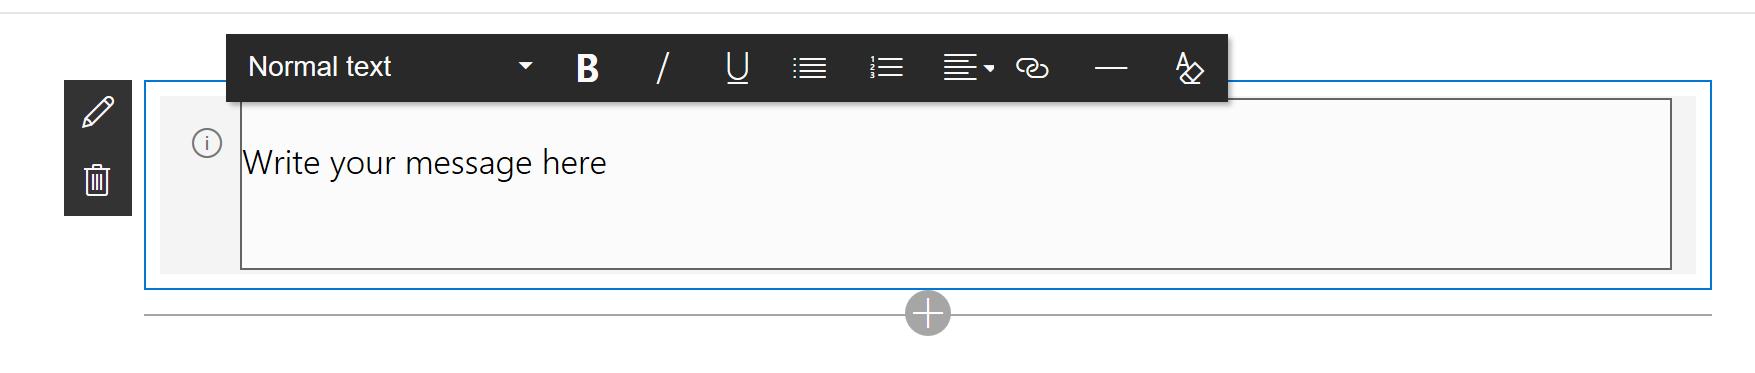 custom textbox